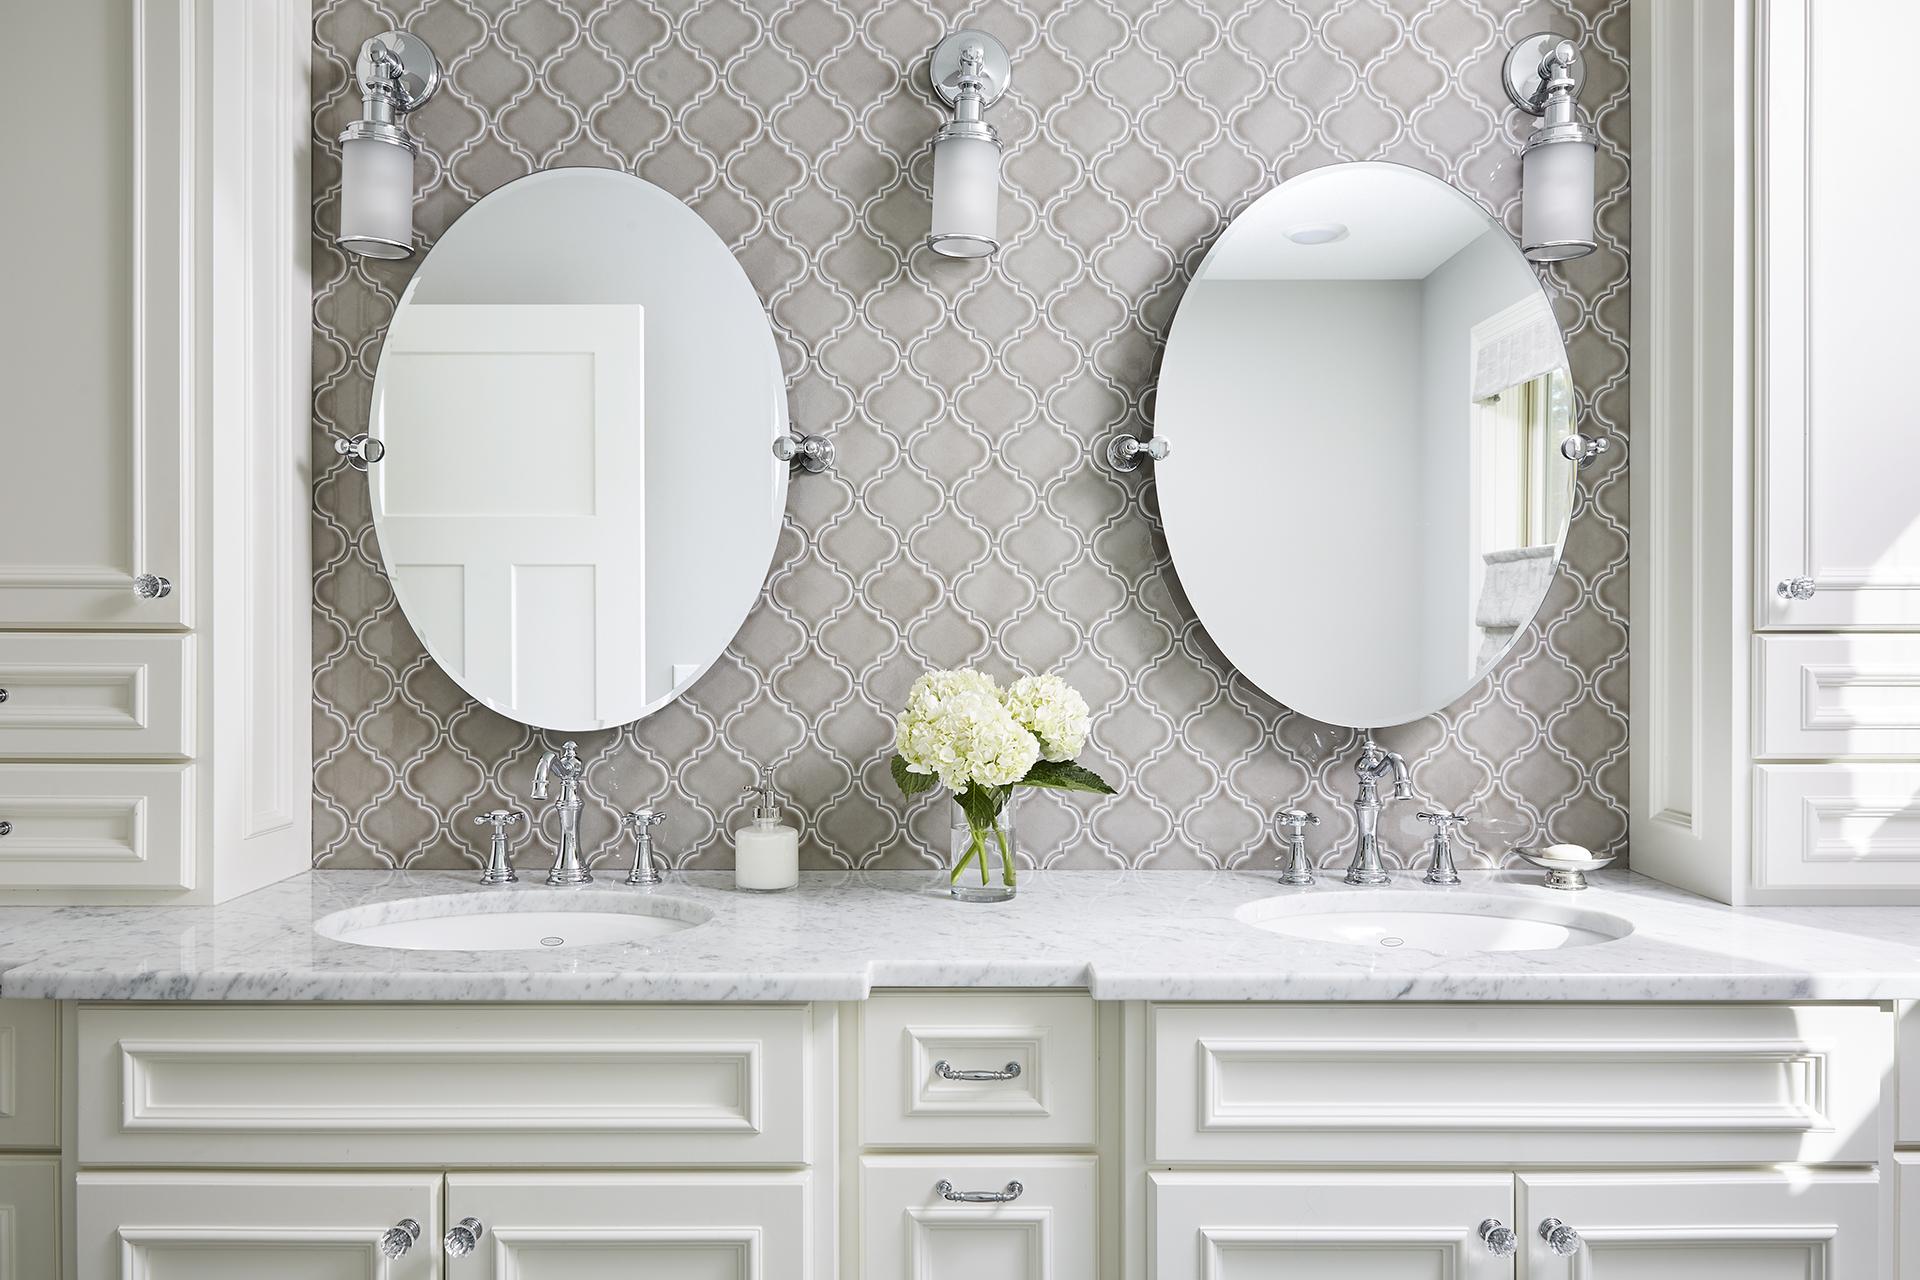 - Master Bathroom With Warm Gray Arabesque Tile Sneak Peek Design